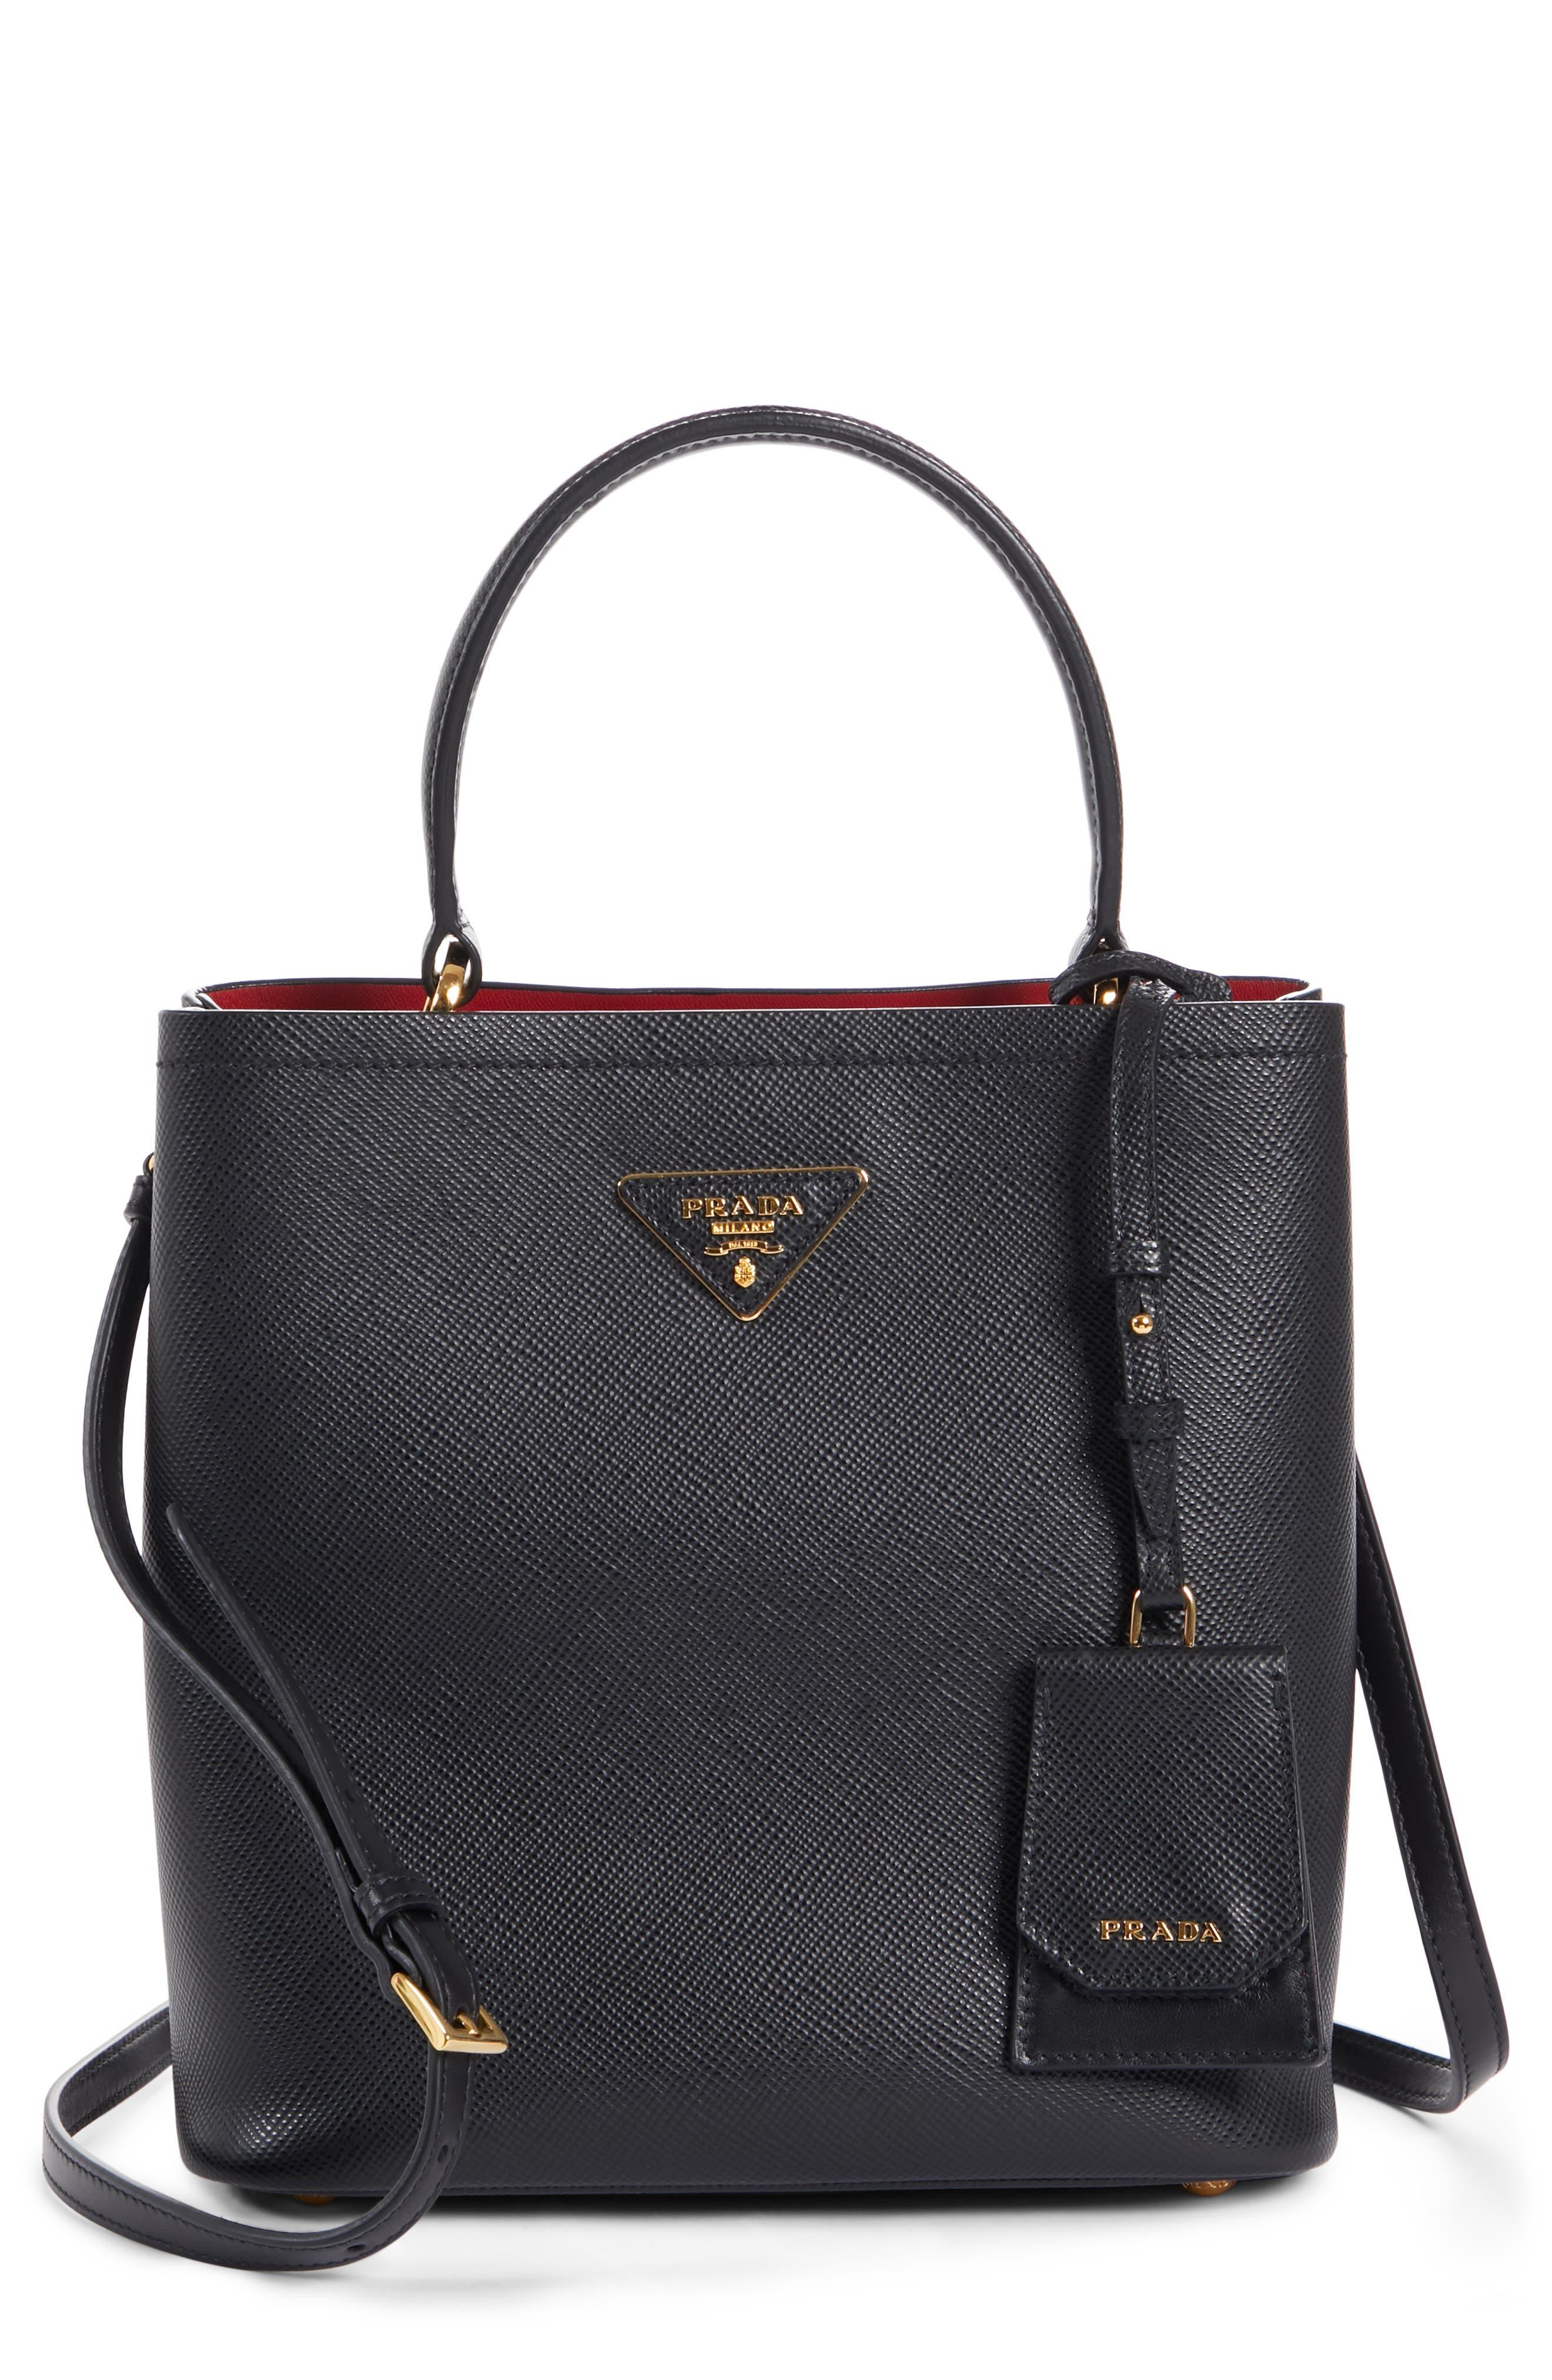 PRADA,                             Double Bucket Bag,                             Main thumbnail 1, color,                             NERO/ FUOCO